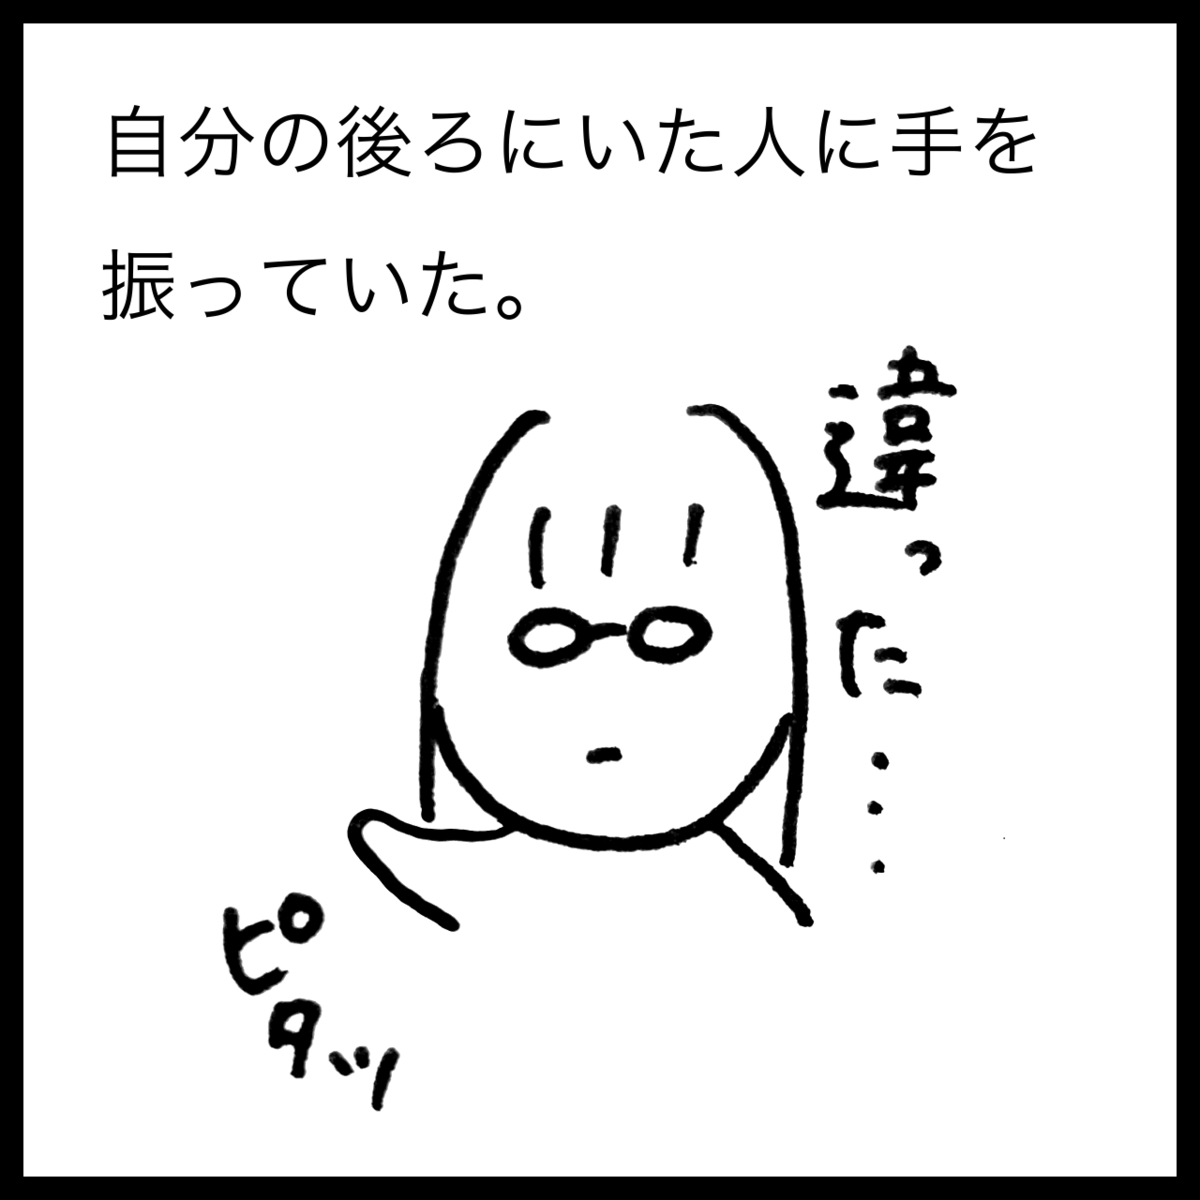 f:id:komyusyomama:20210821215321p:plain